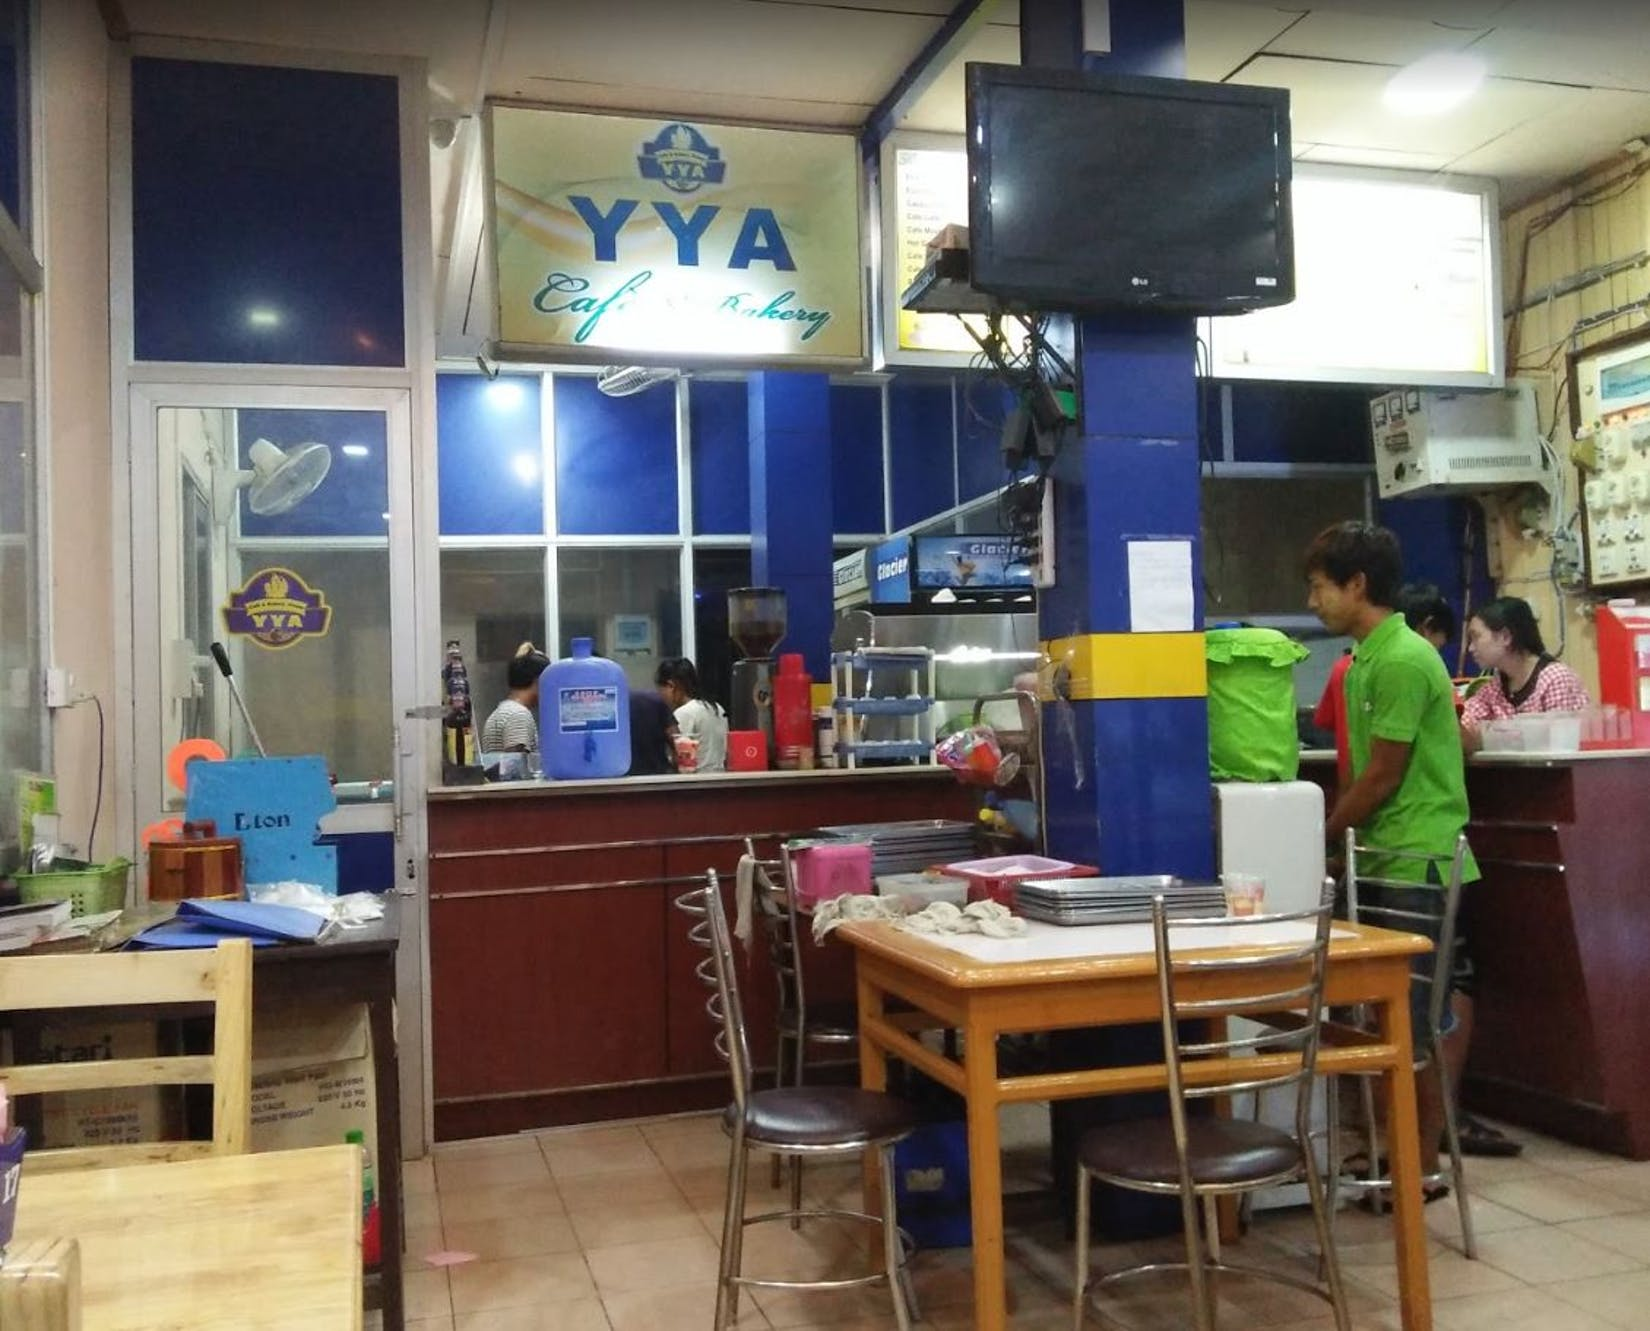 YYA Cafe & Bakery | yathar